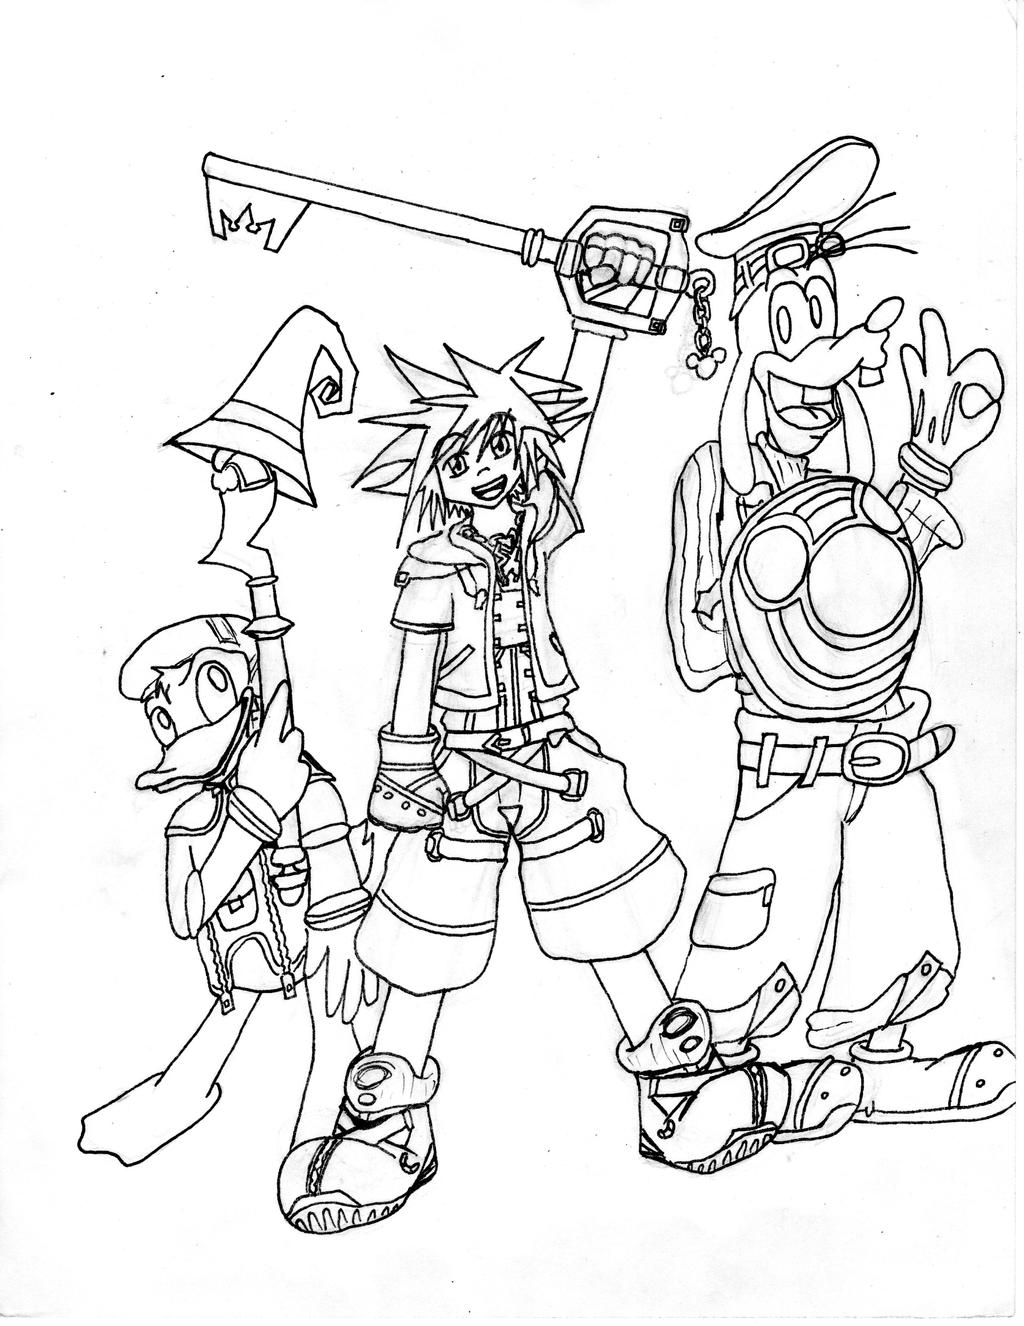 Kingdom Hearts Lineart : Kingdom hearts line art by axeldk on deviantart